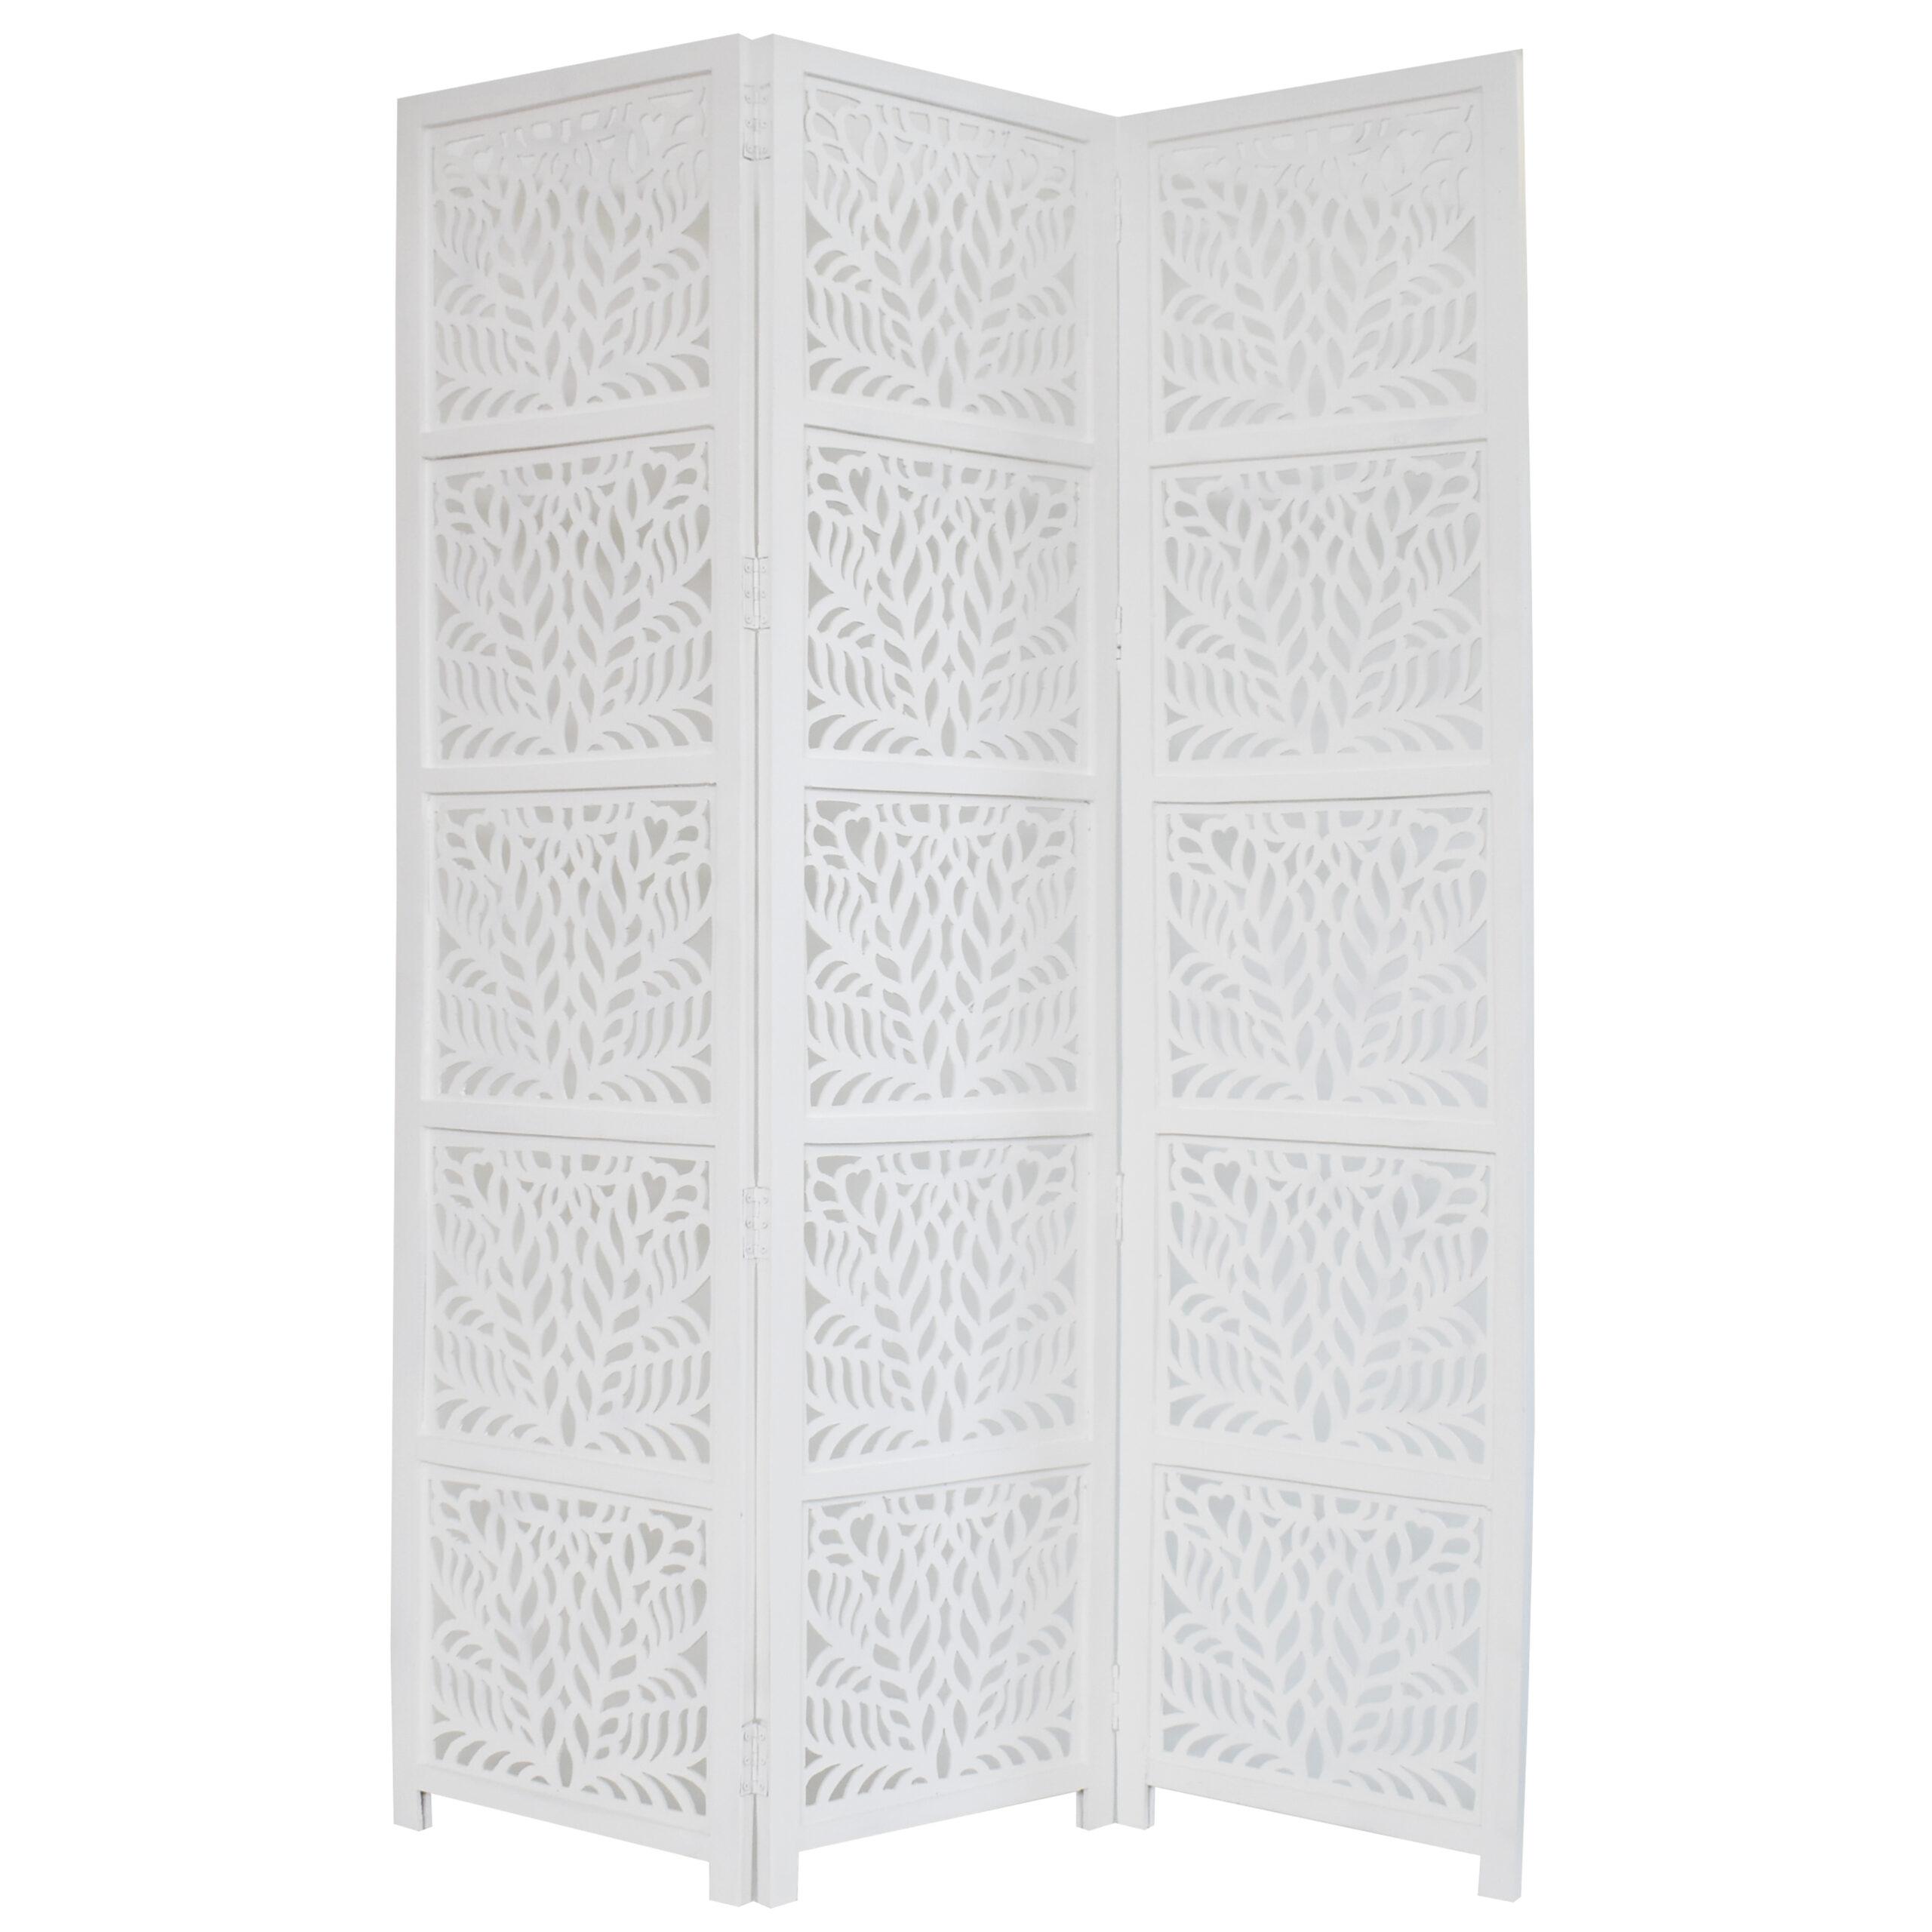 Fern 3 Panel Wood Screen, White